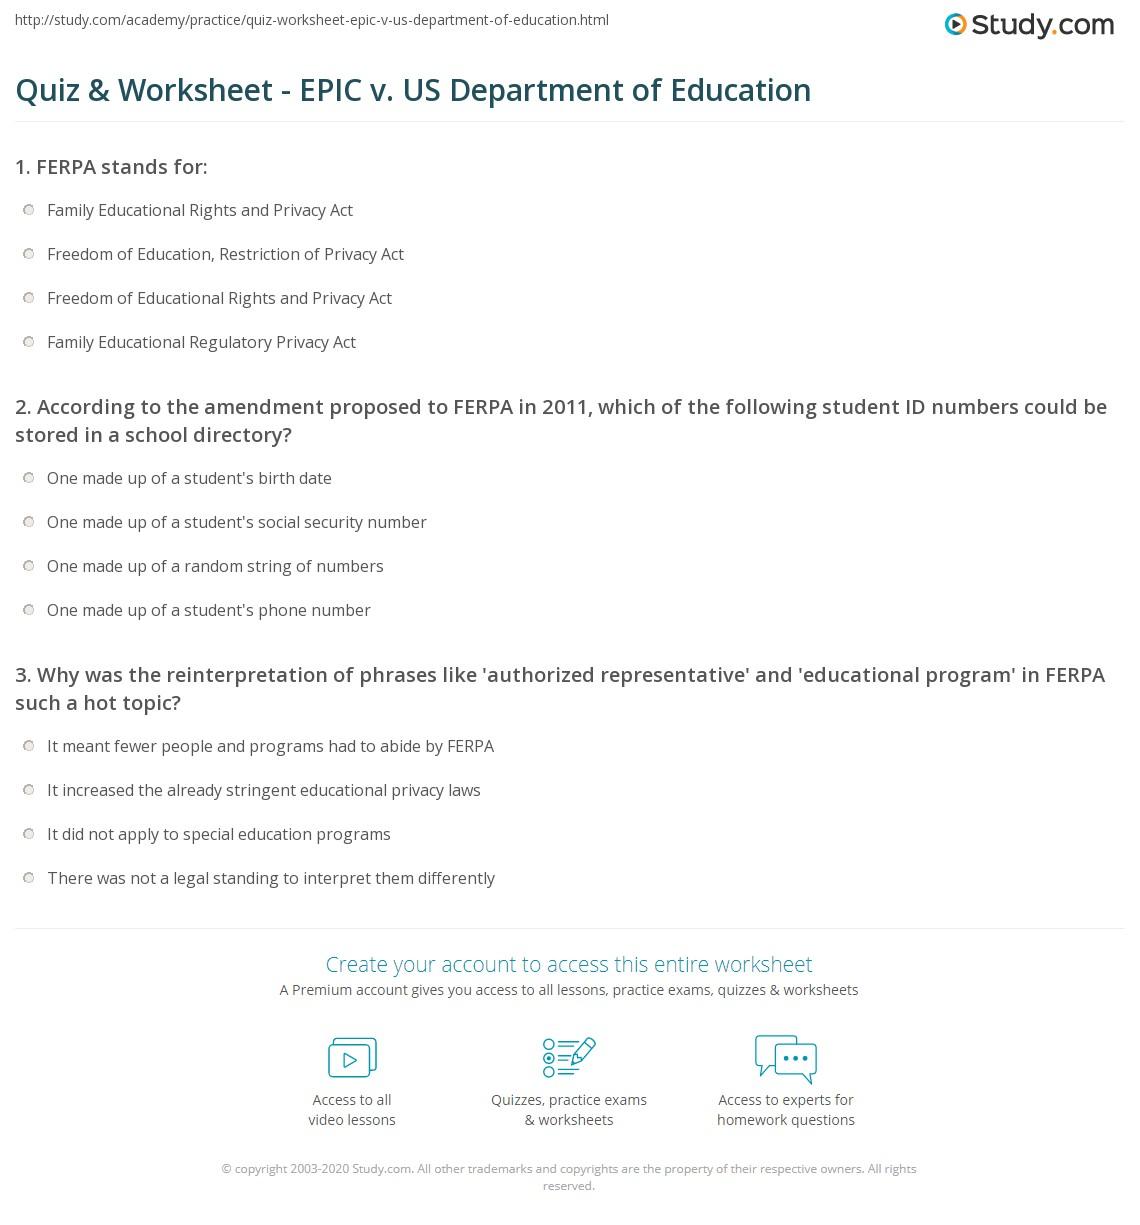 Quiz & Worksheet - EPIC v. US Department of Education | Study.com